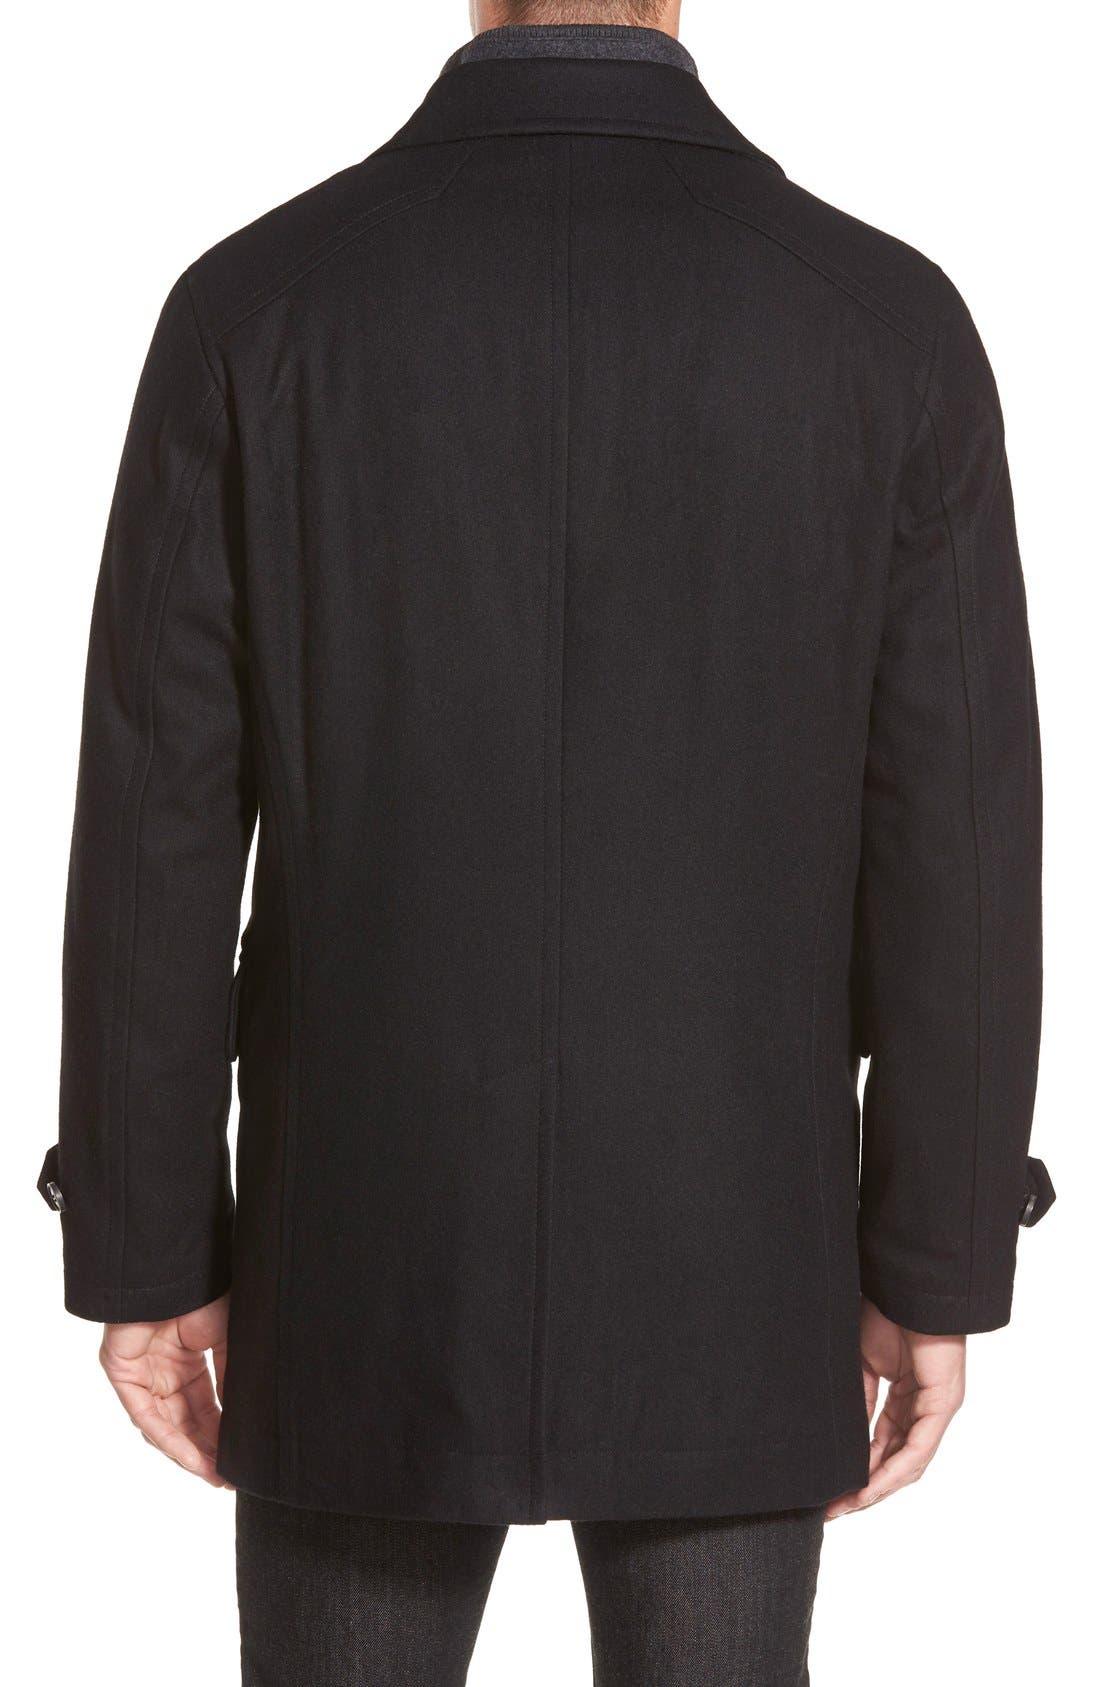 MICHAEL KORS,                             Car Coat,                             Alternate thumbnail 3, color,                             001